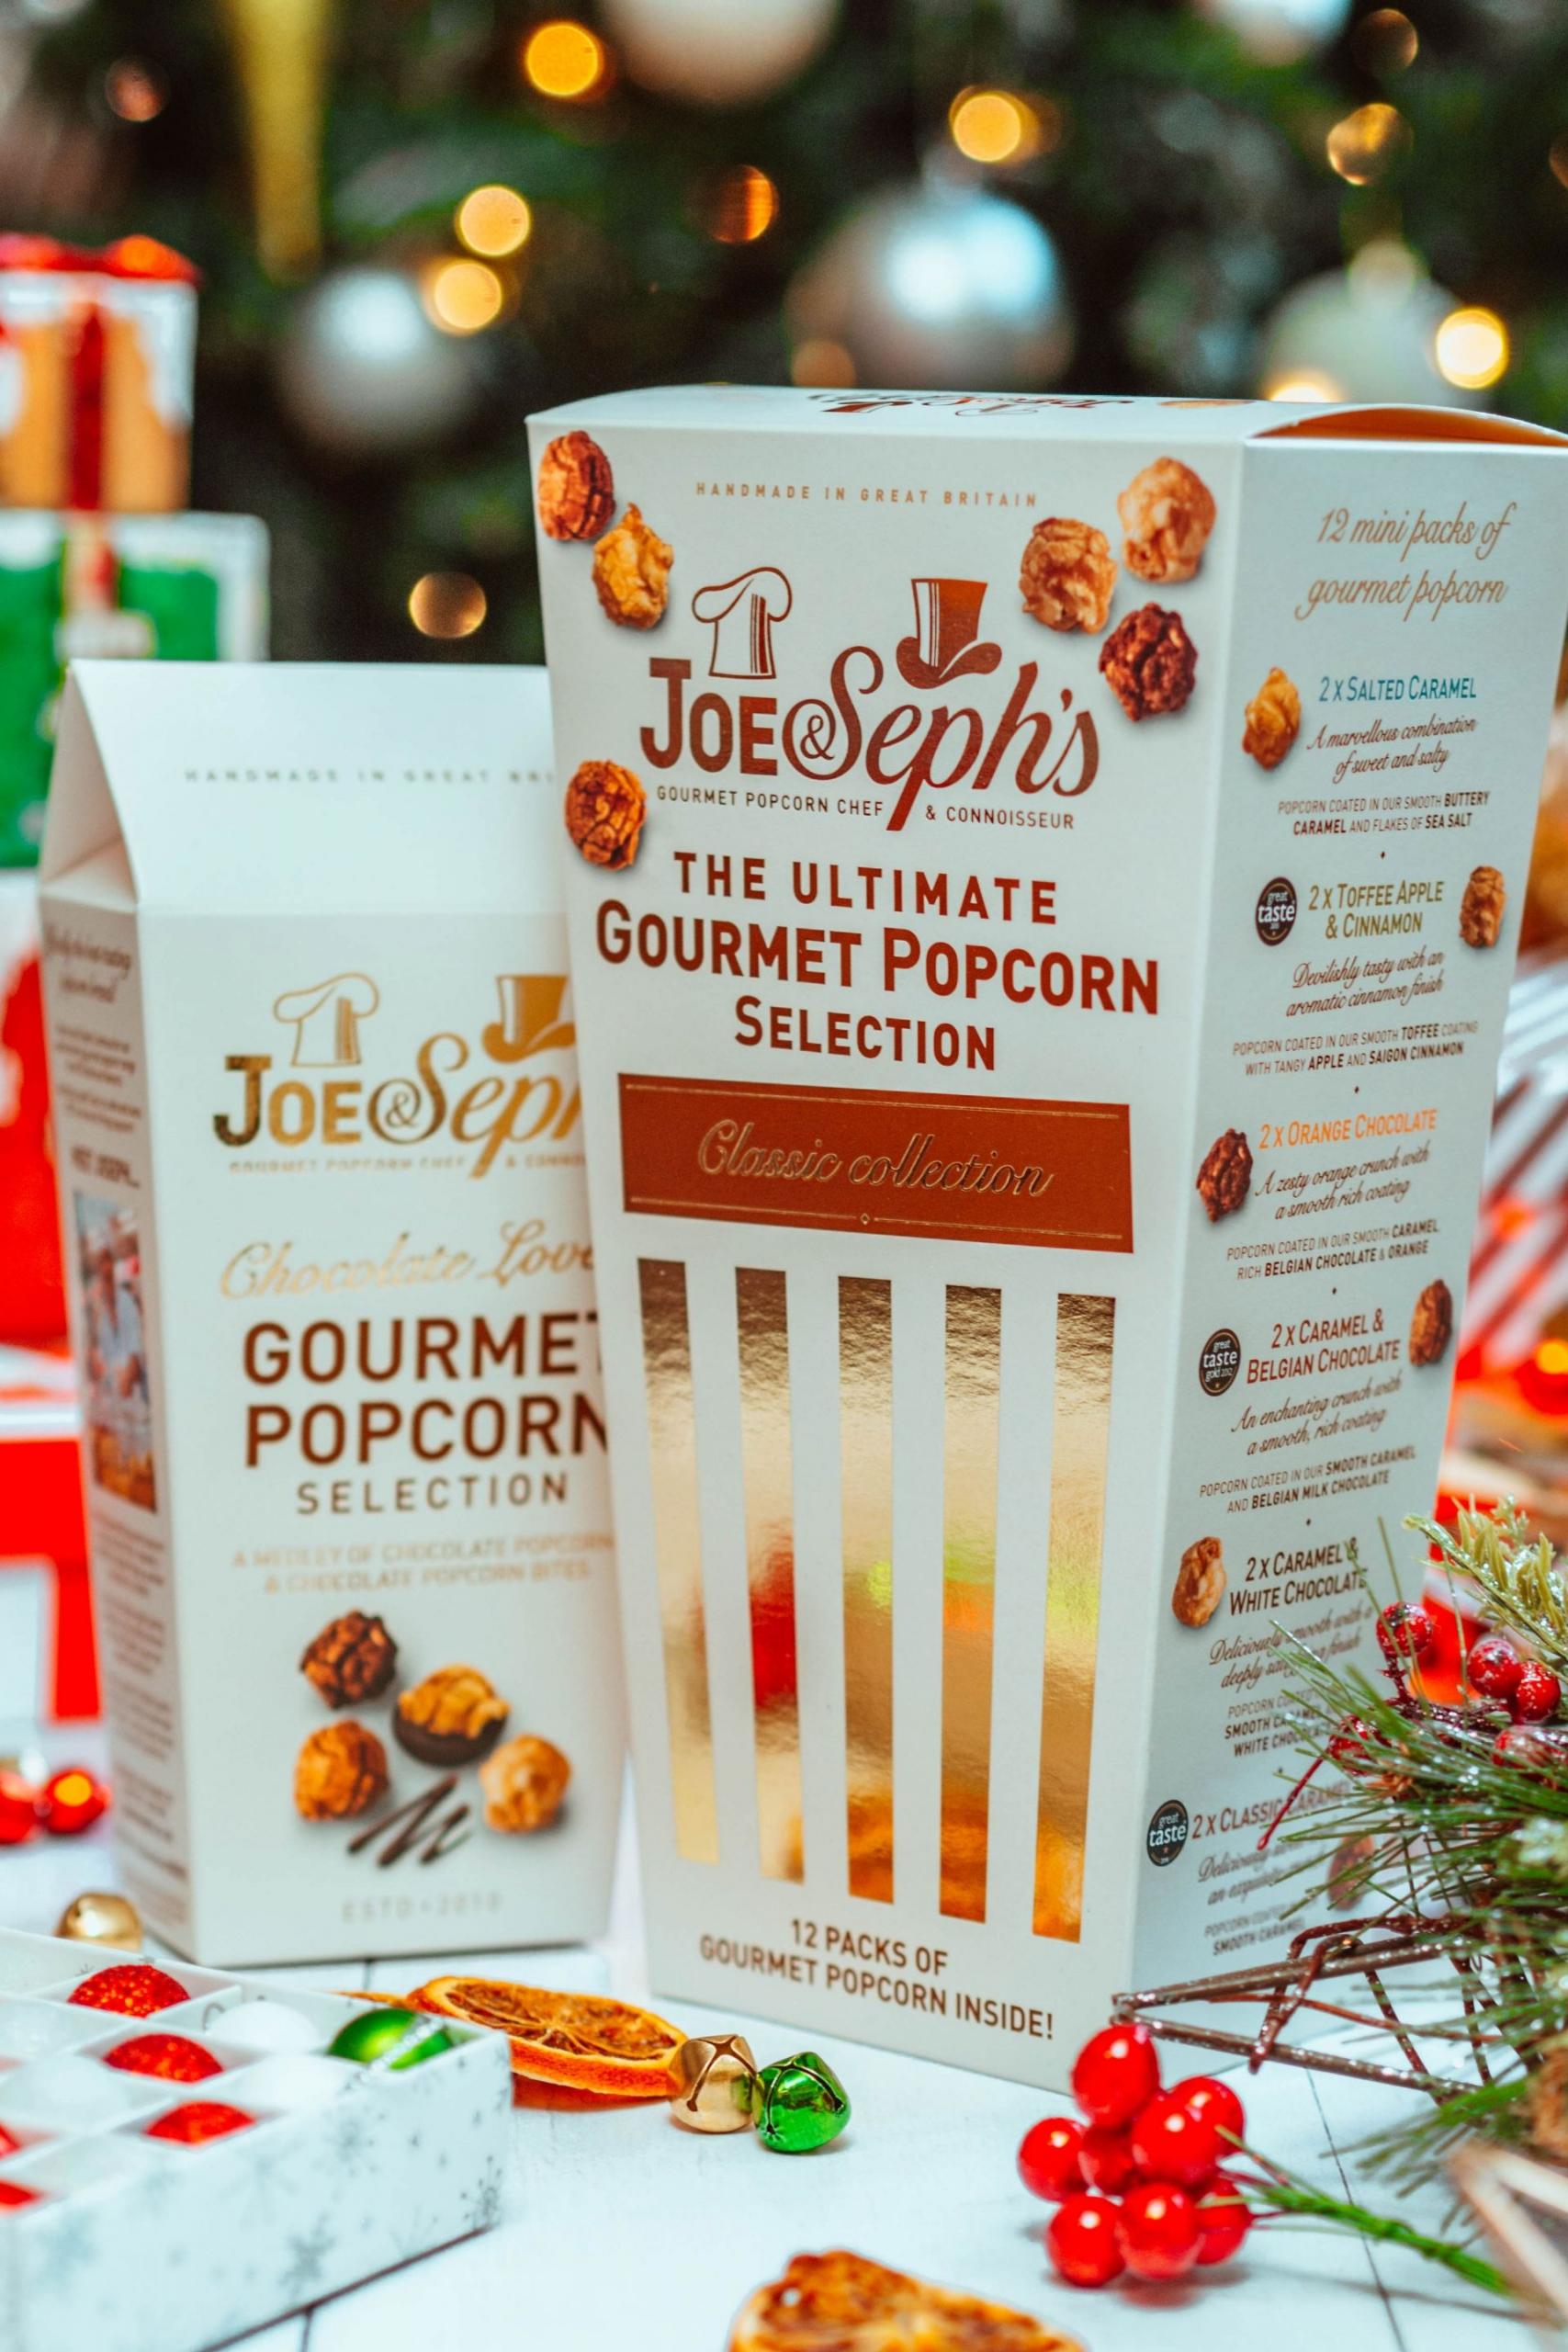 Joe & Seph's Popcorn Review